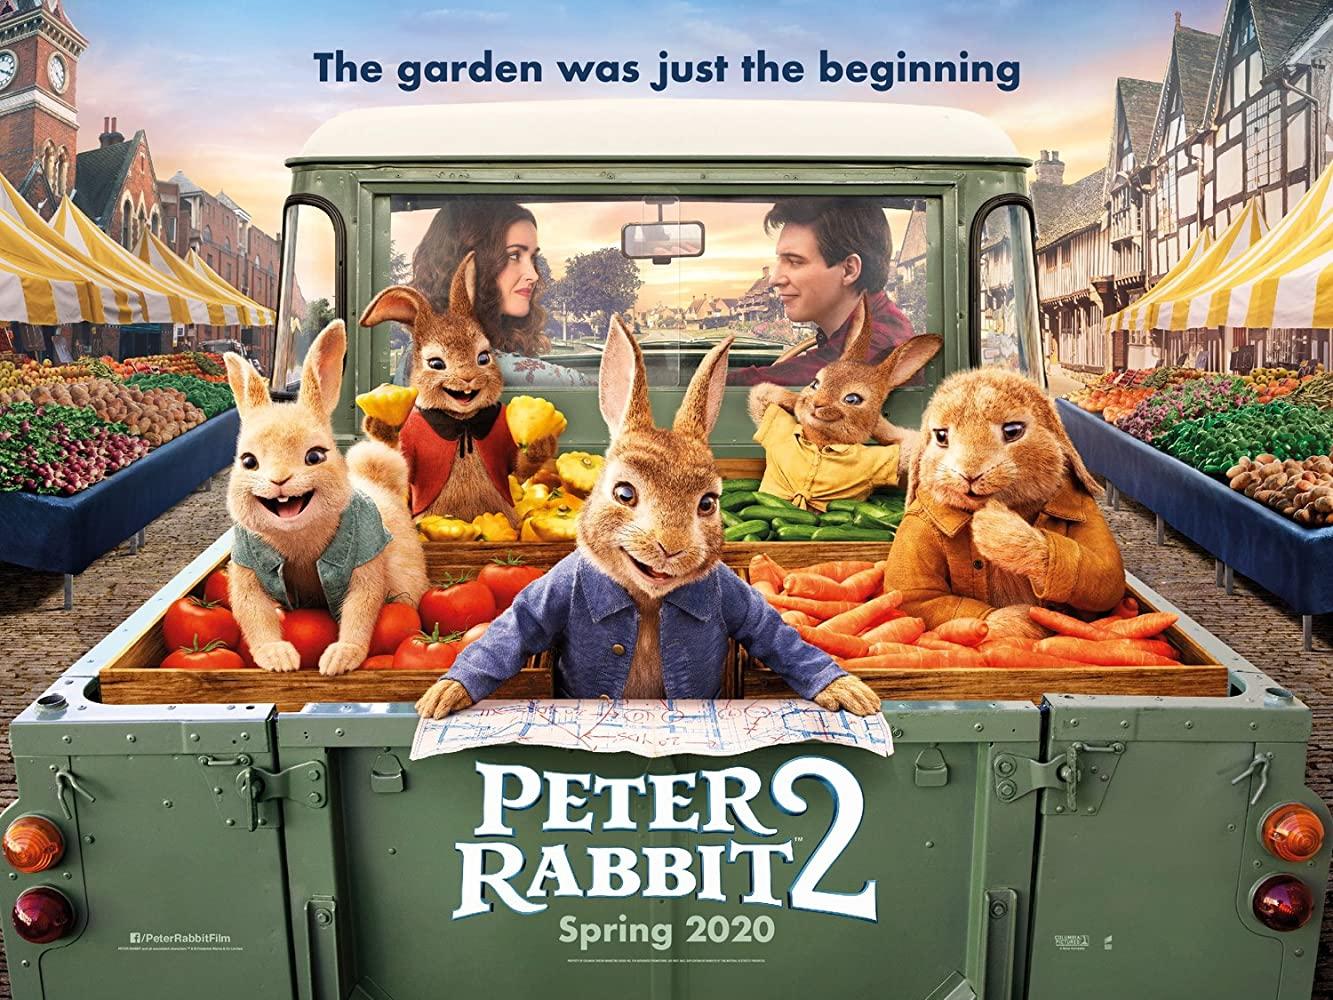 Xem Phim Thỏ Peter 2 - Peter Rabbit 2 Full Vietsub   Thuyết Minh HD Online